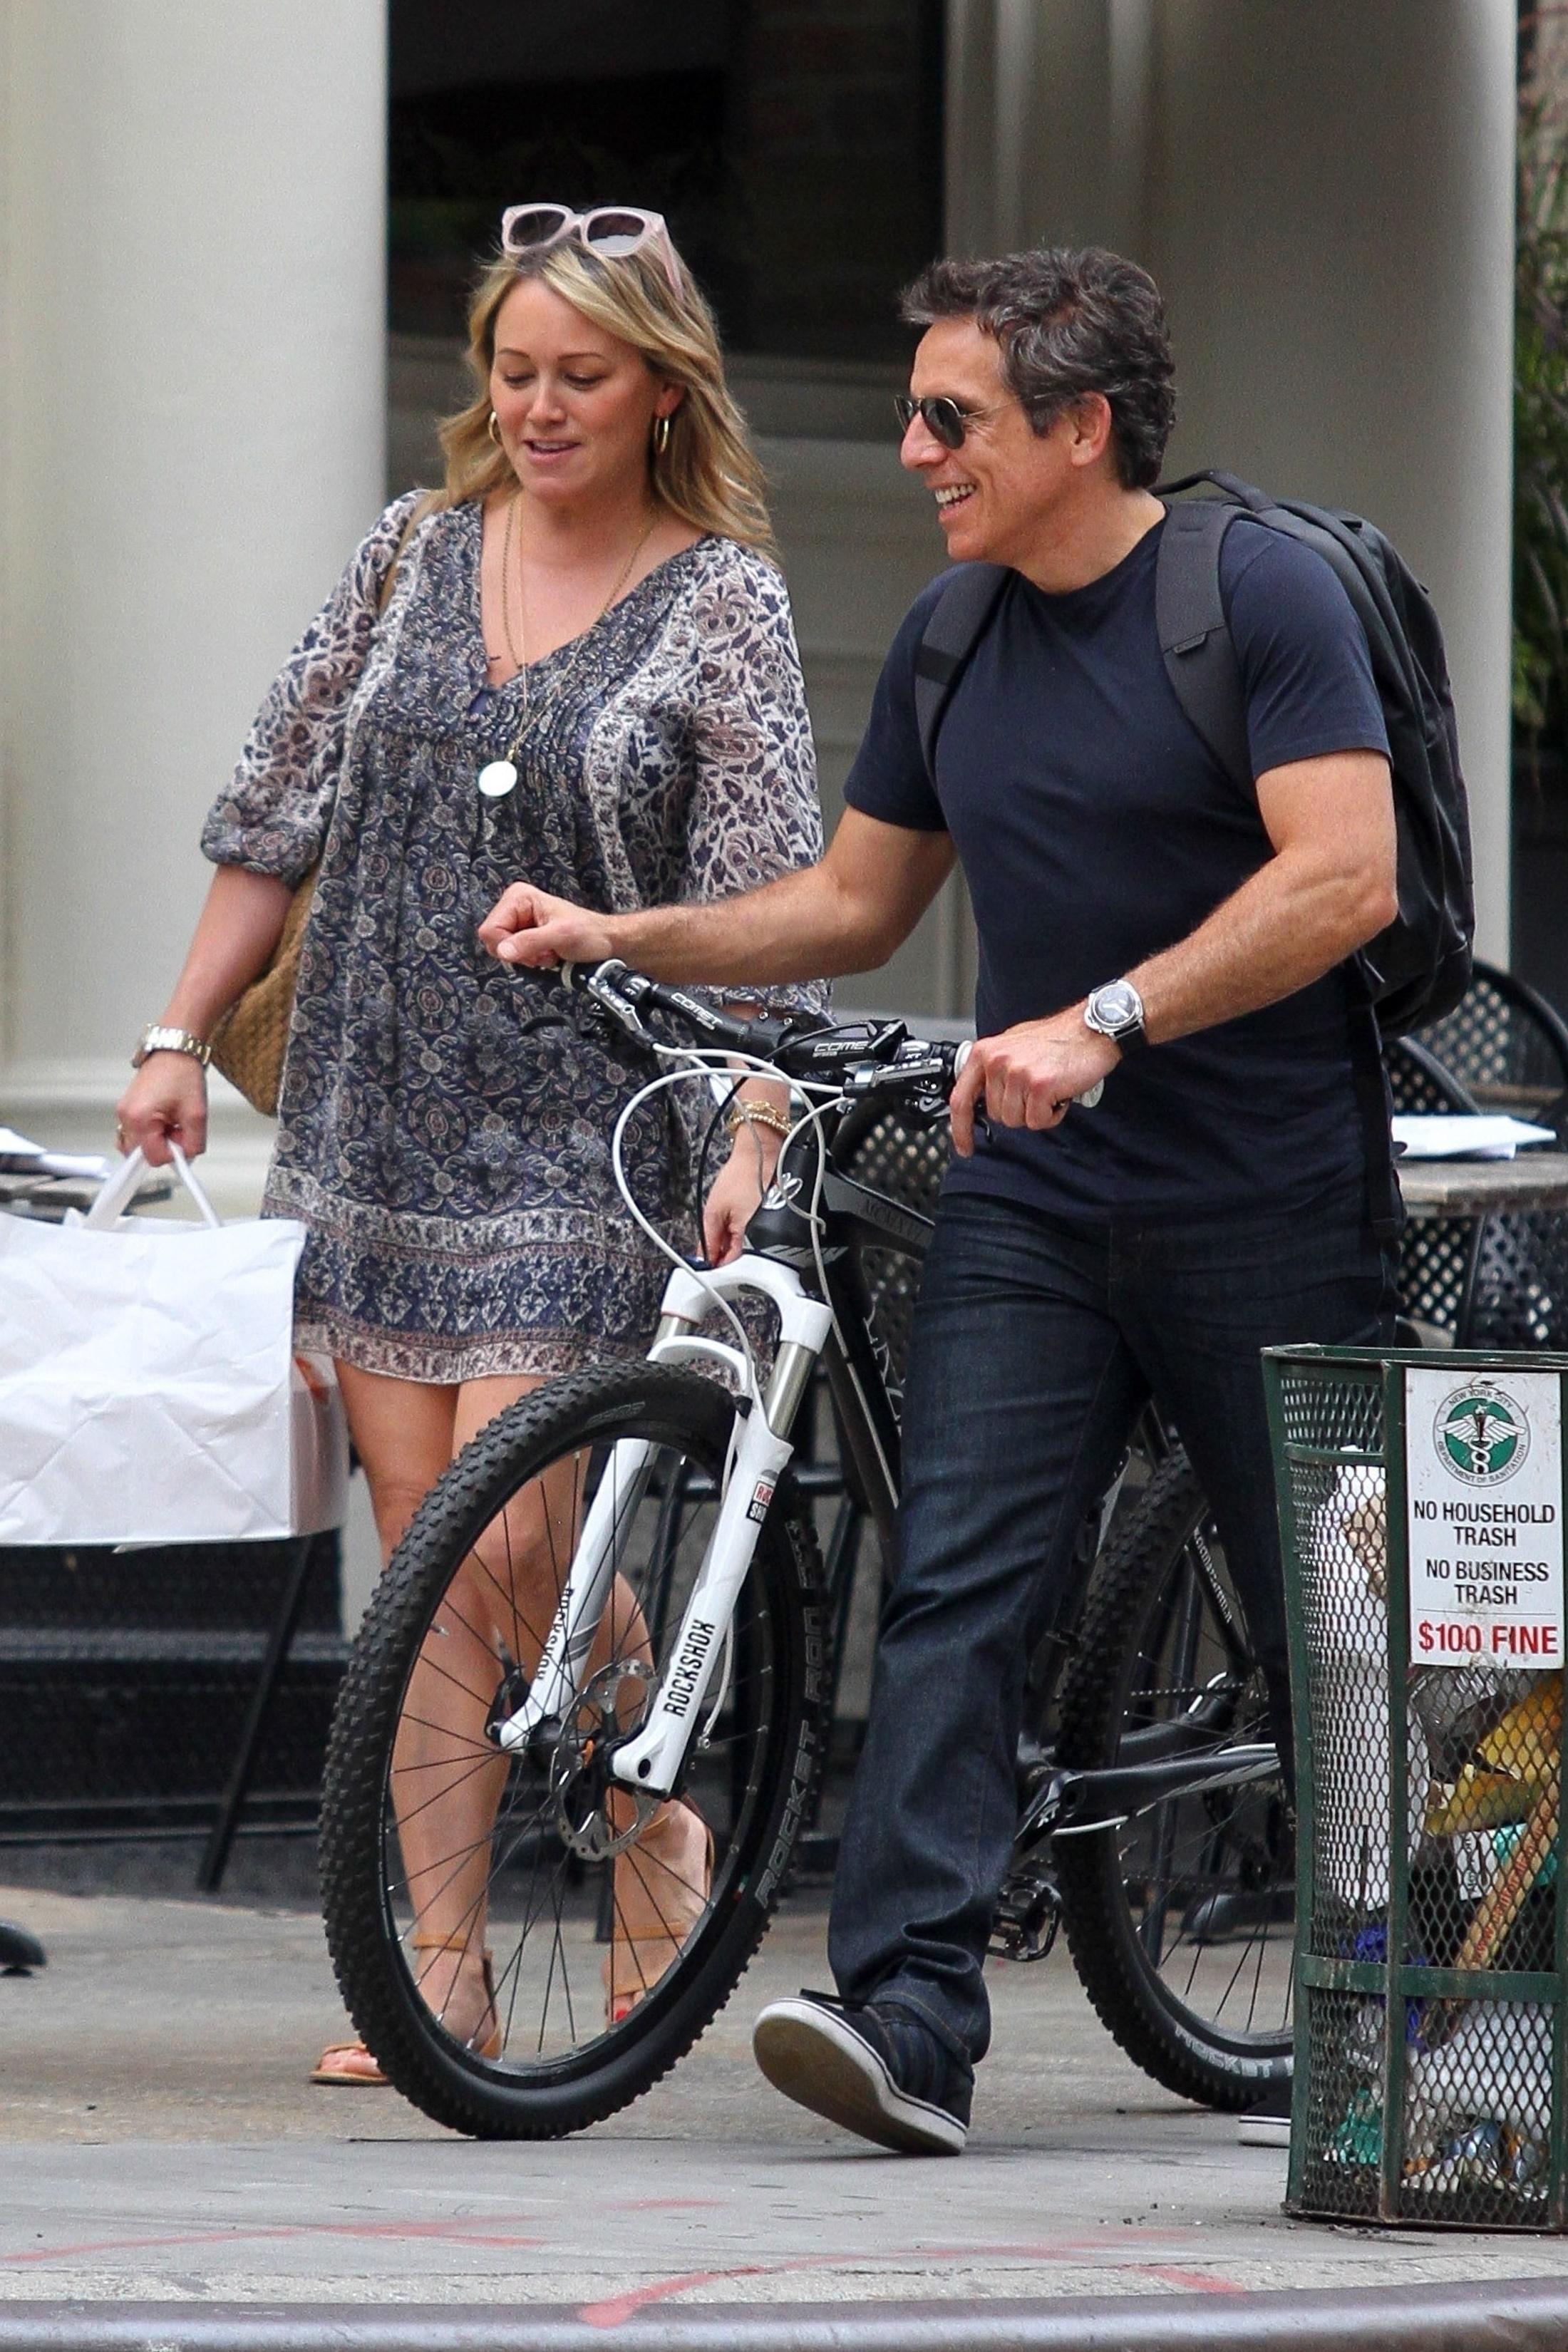 Ben Stiller holds hands with his ex, Christine Taylor